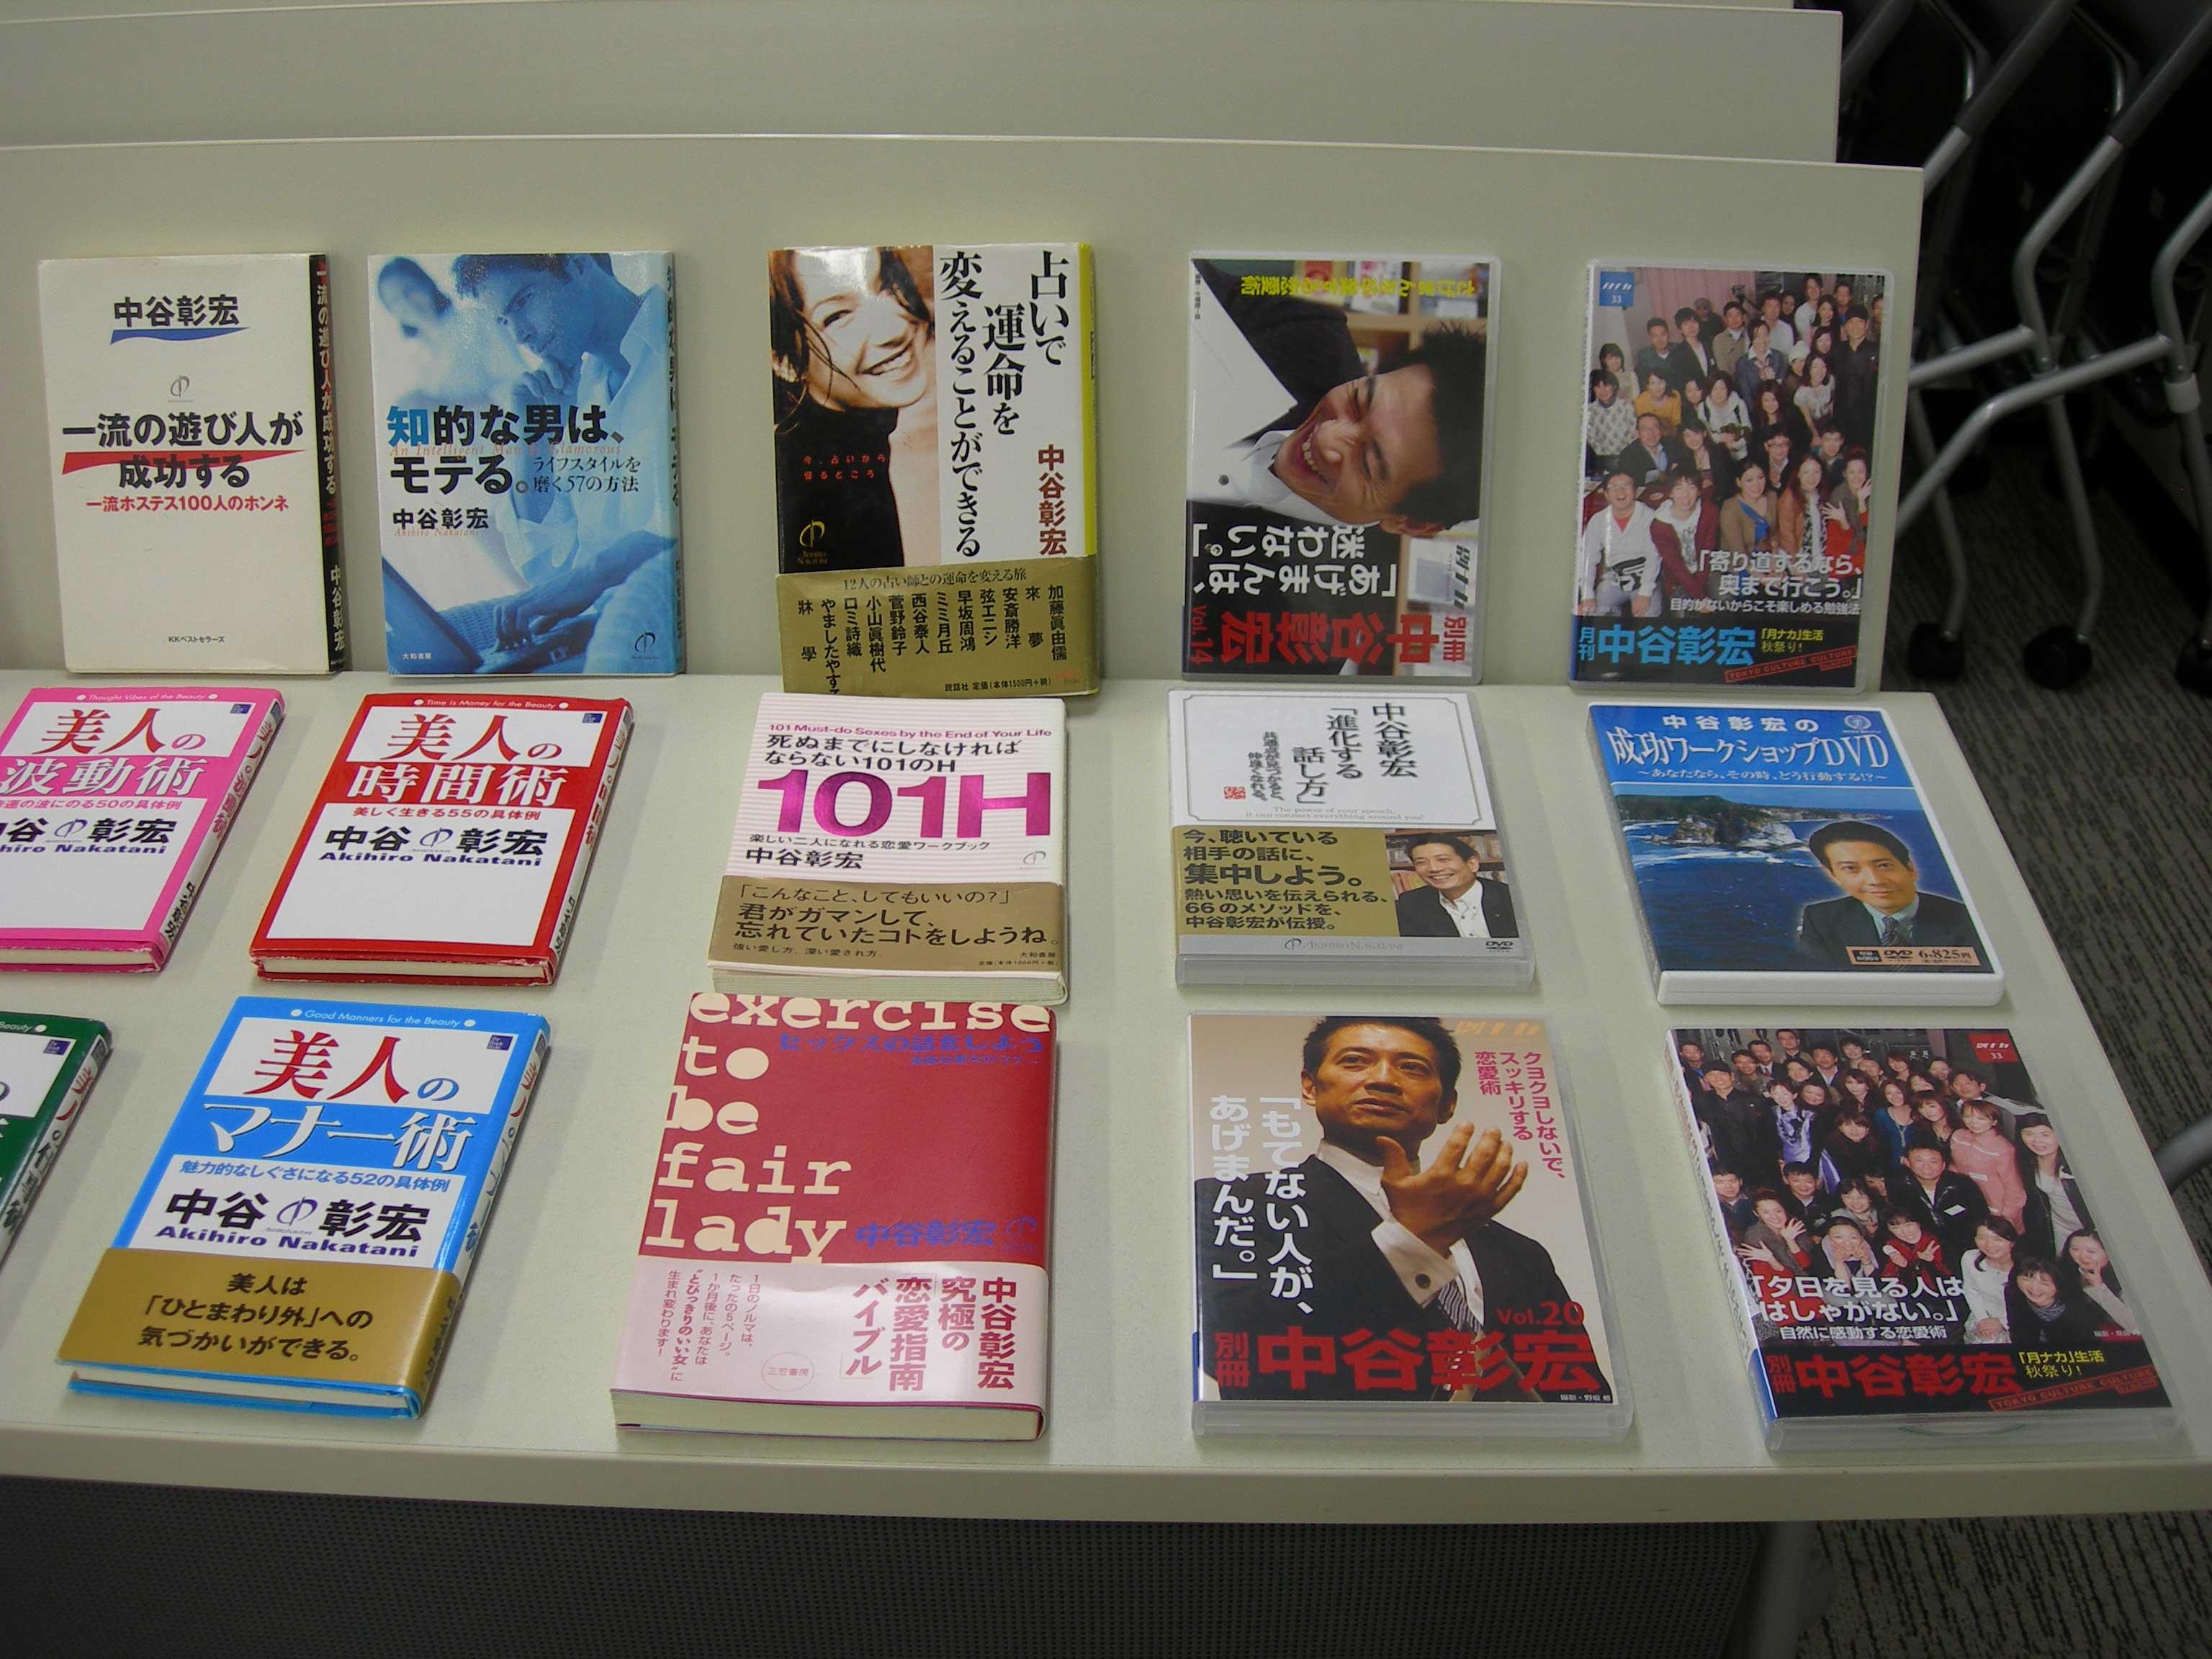 20100314_紹介コーナー_2.jpg